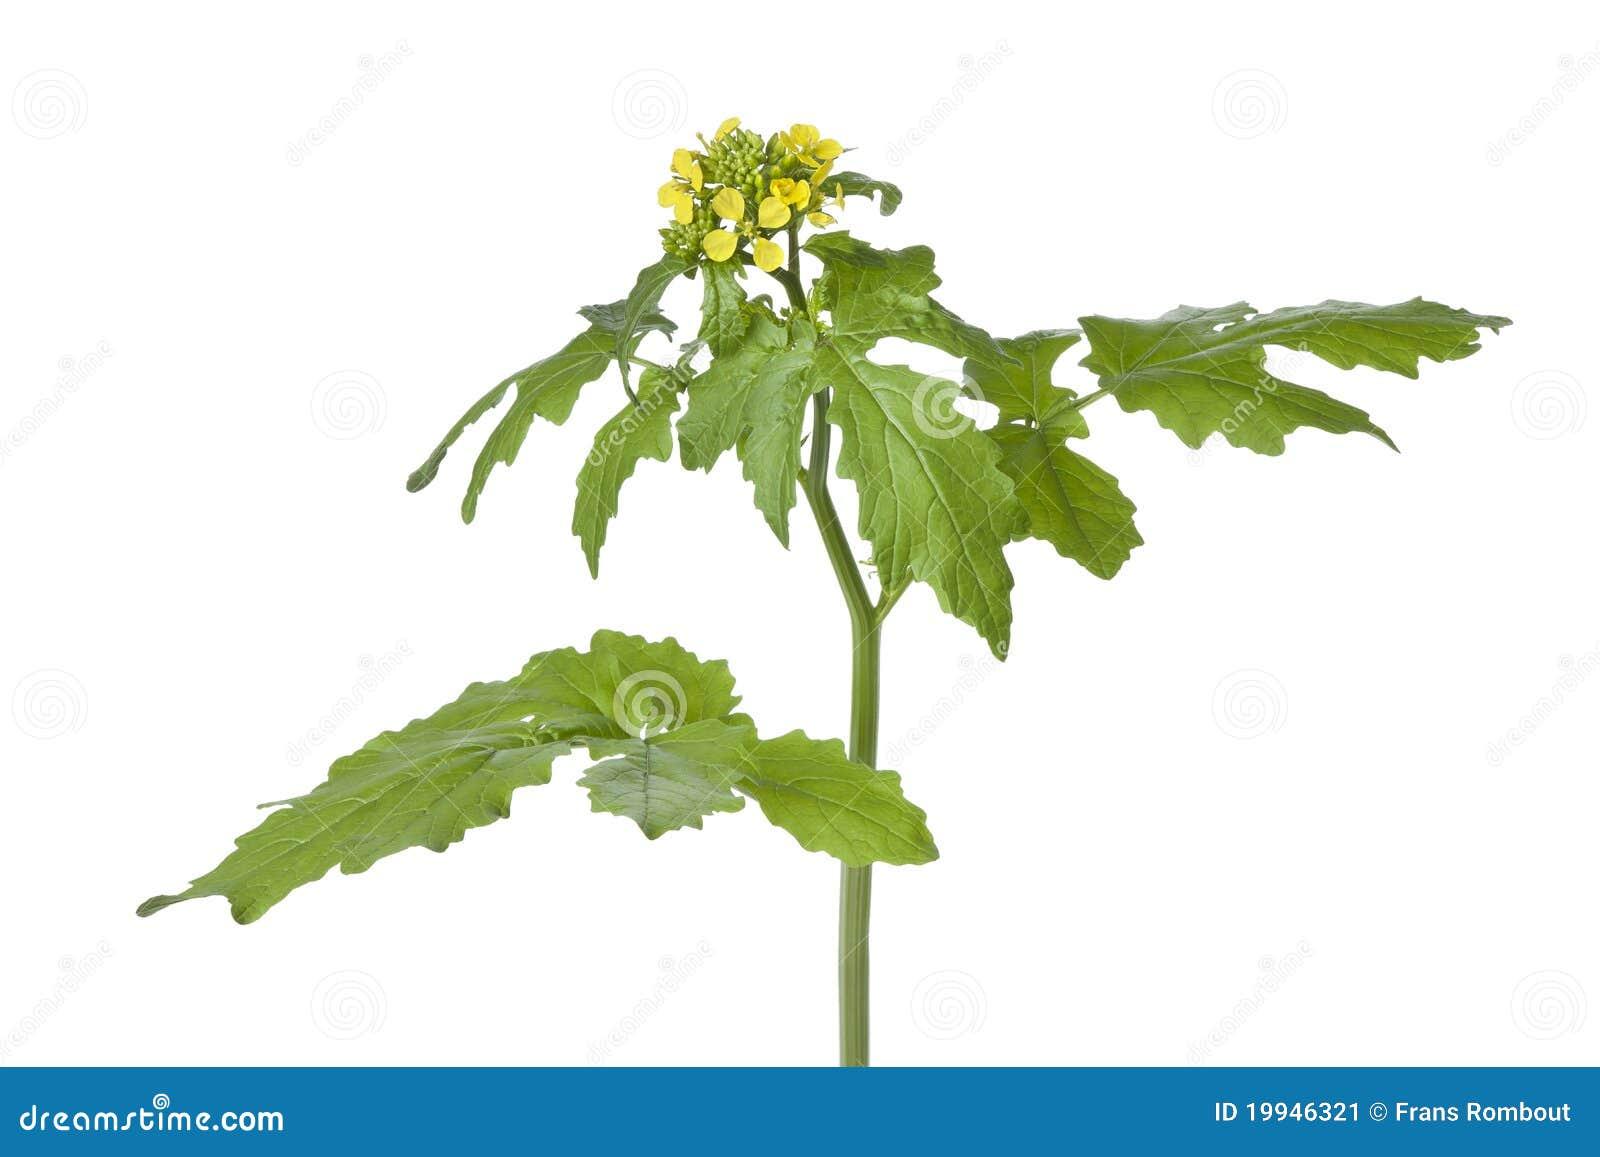 Flowering Mustard Plant Stock Image - Image: 19946321